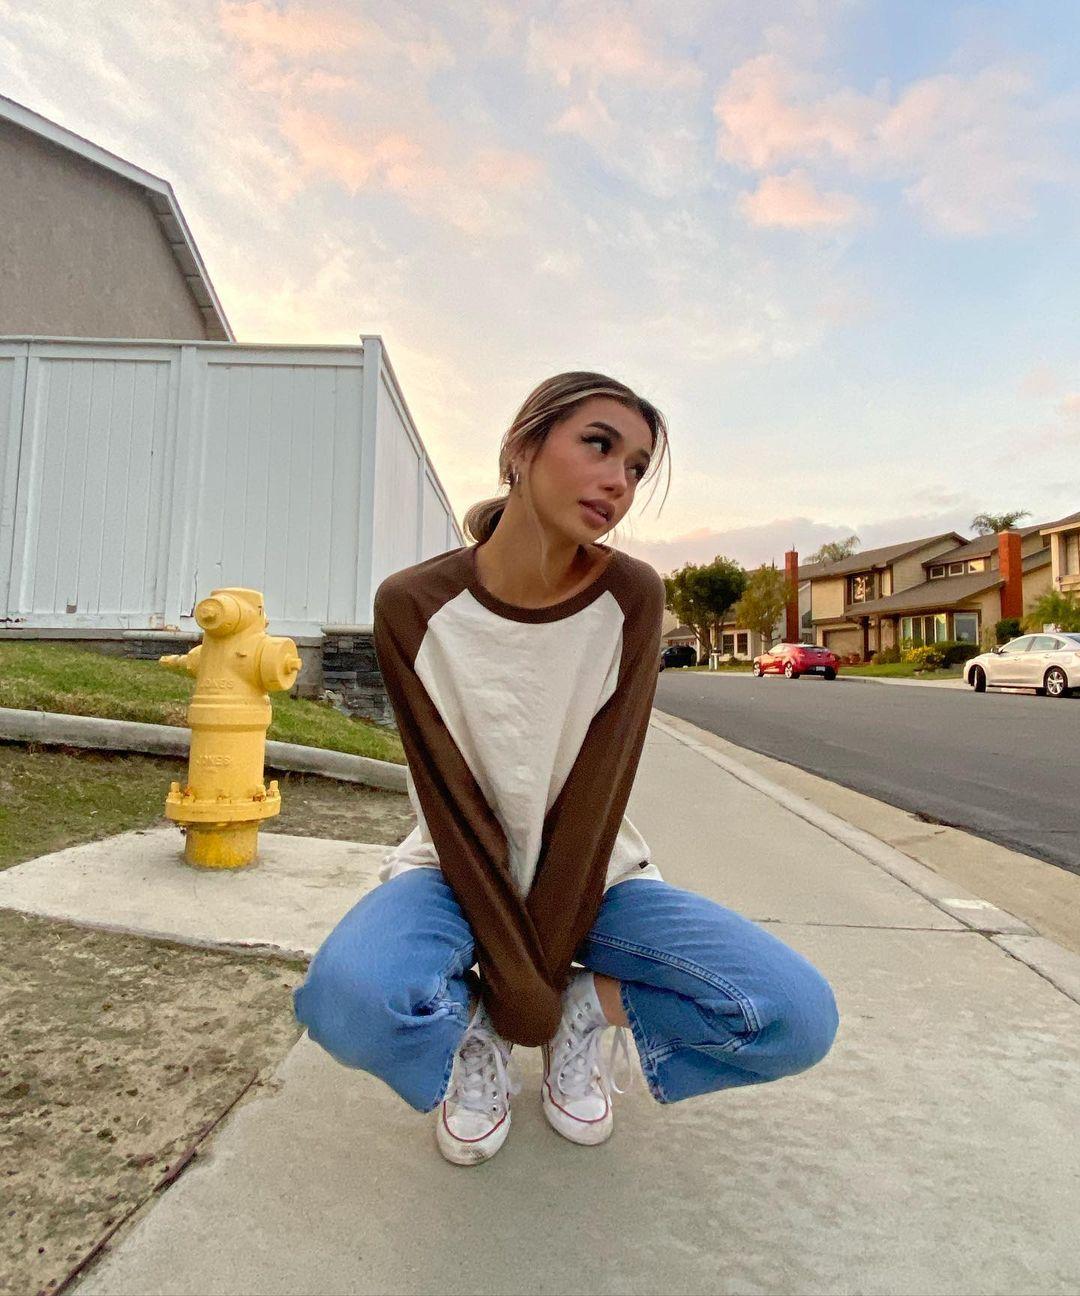 Kaylee-Pereira-Wallpapers-Insta-Fit-Bio-4